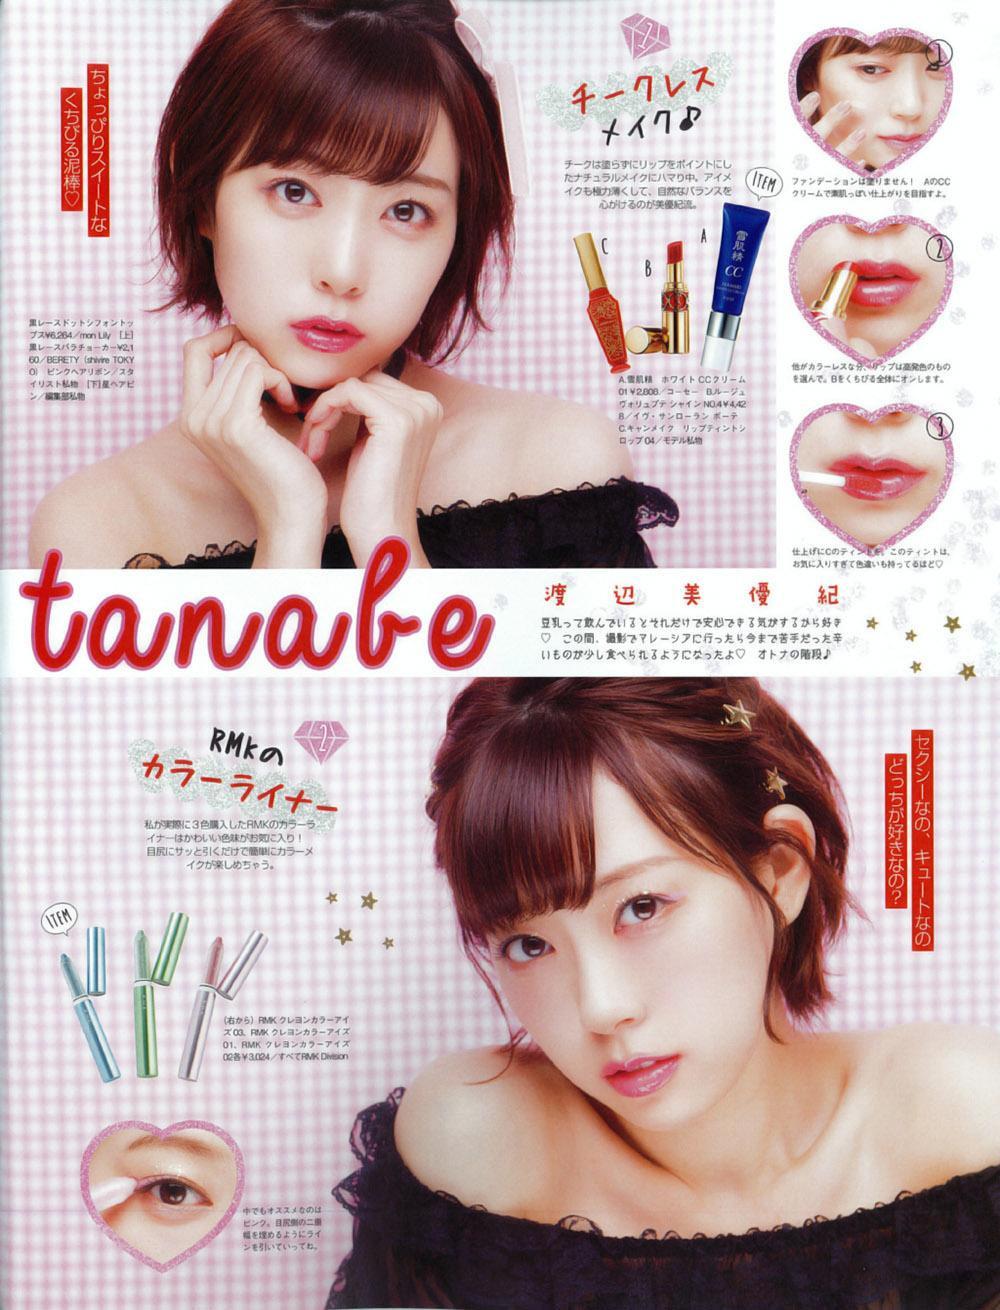 Watanabe Miyuki 渡辺美優紀 NMB48, LARME Magazine 2016 No.023